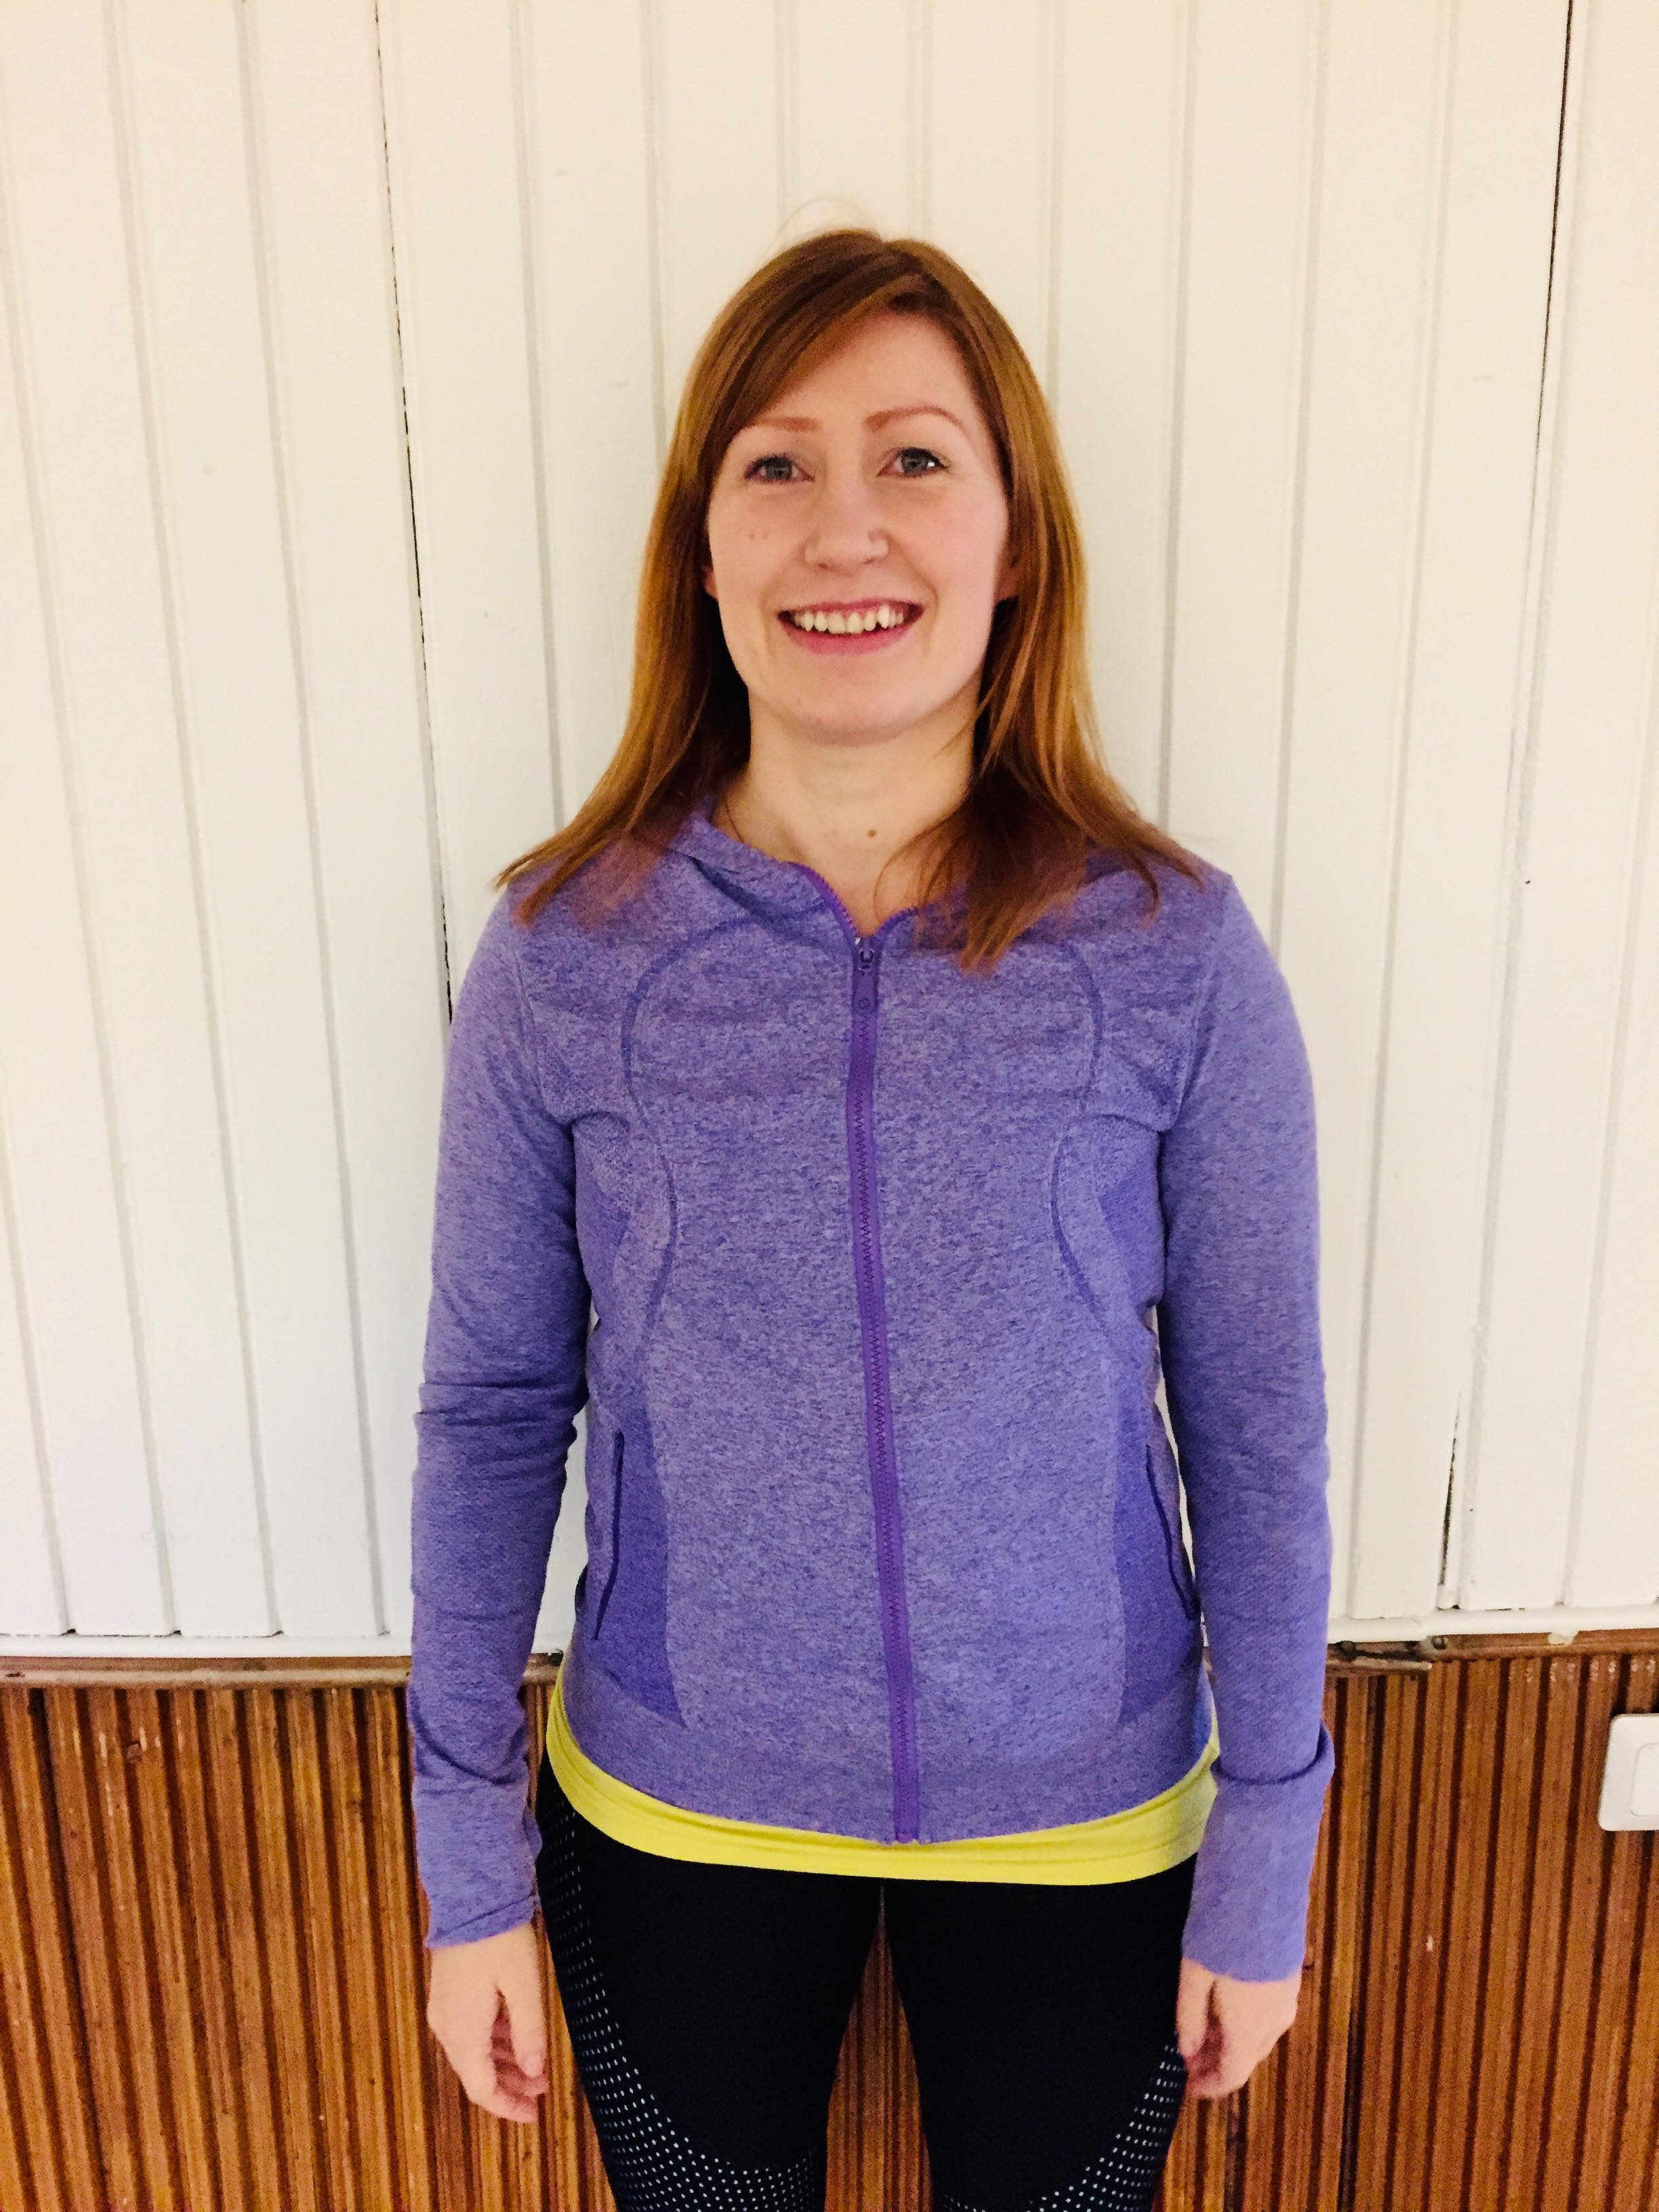 Fysioterapeutti personal trainer Jonna